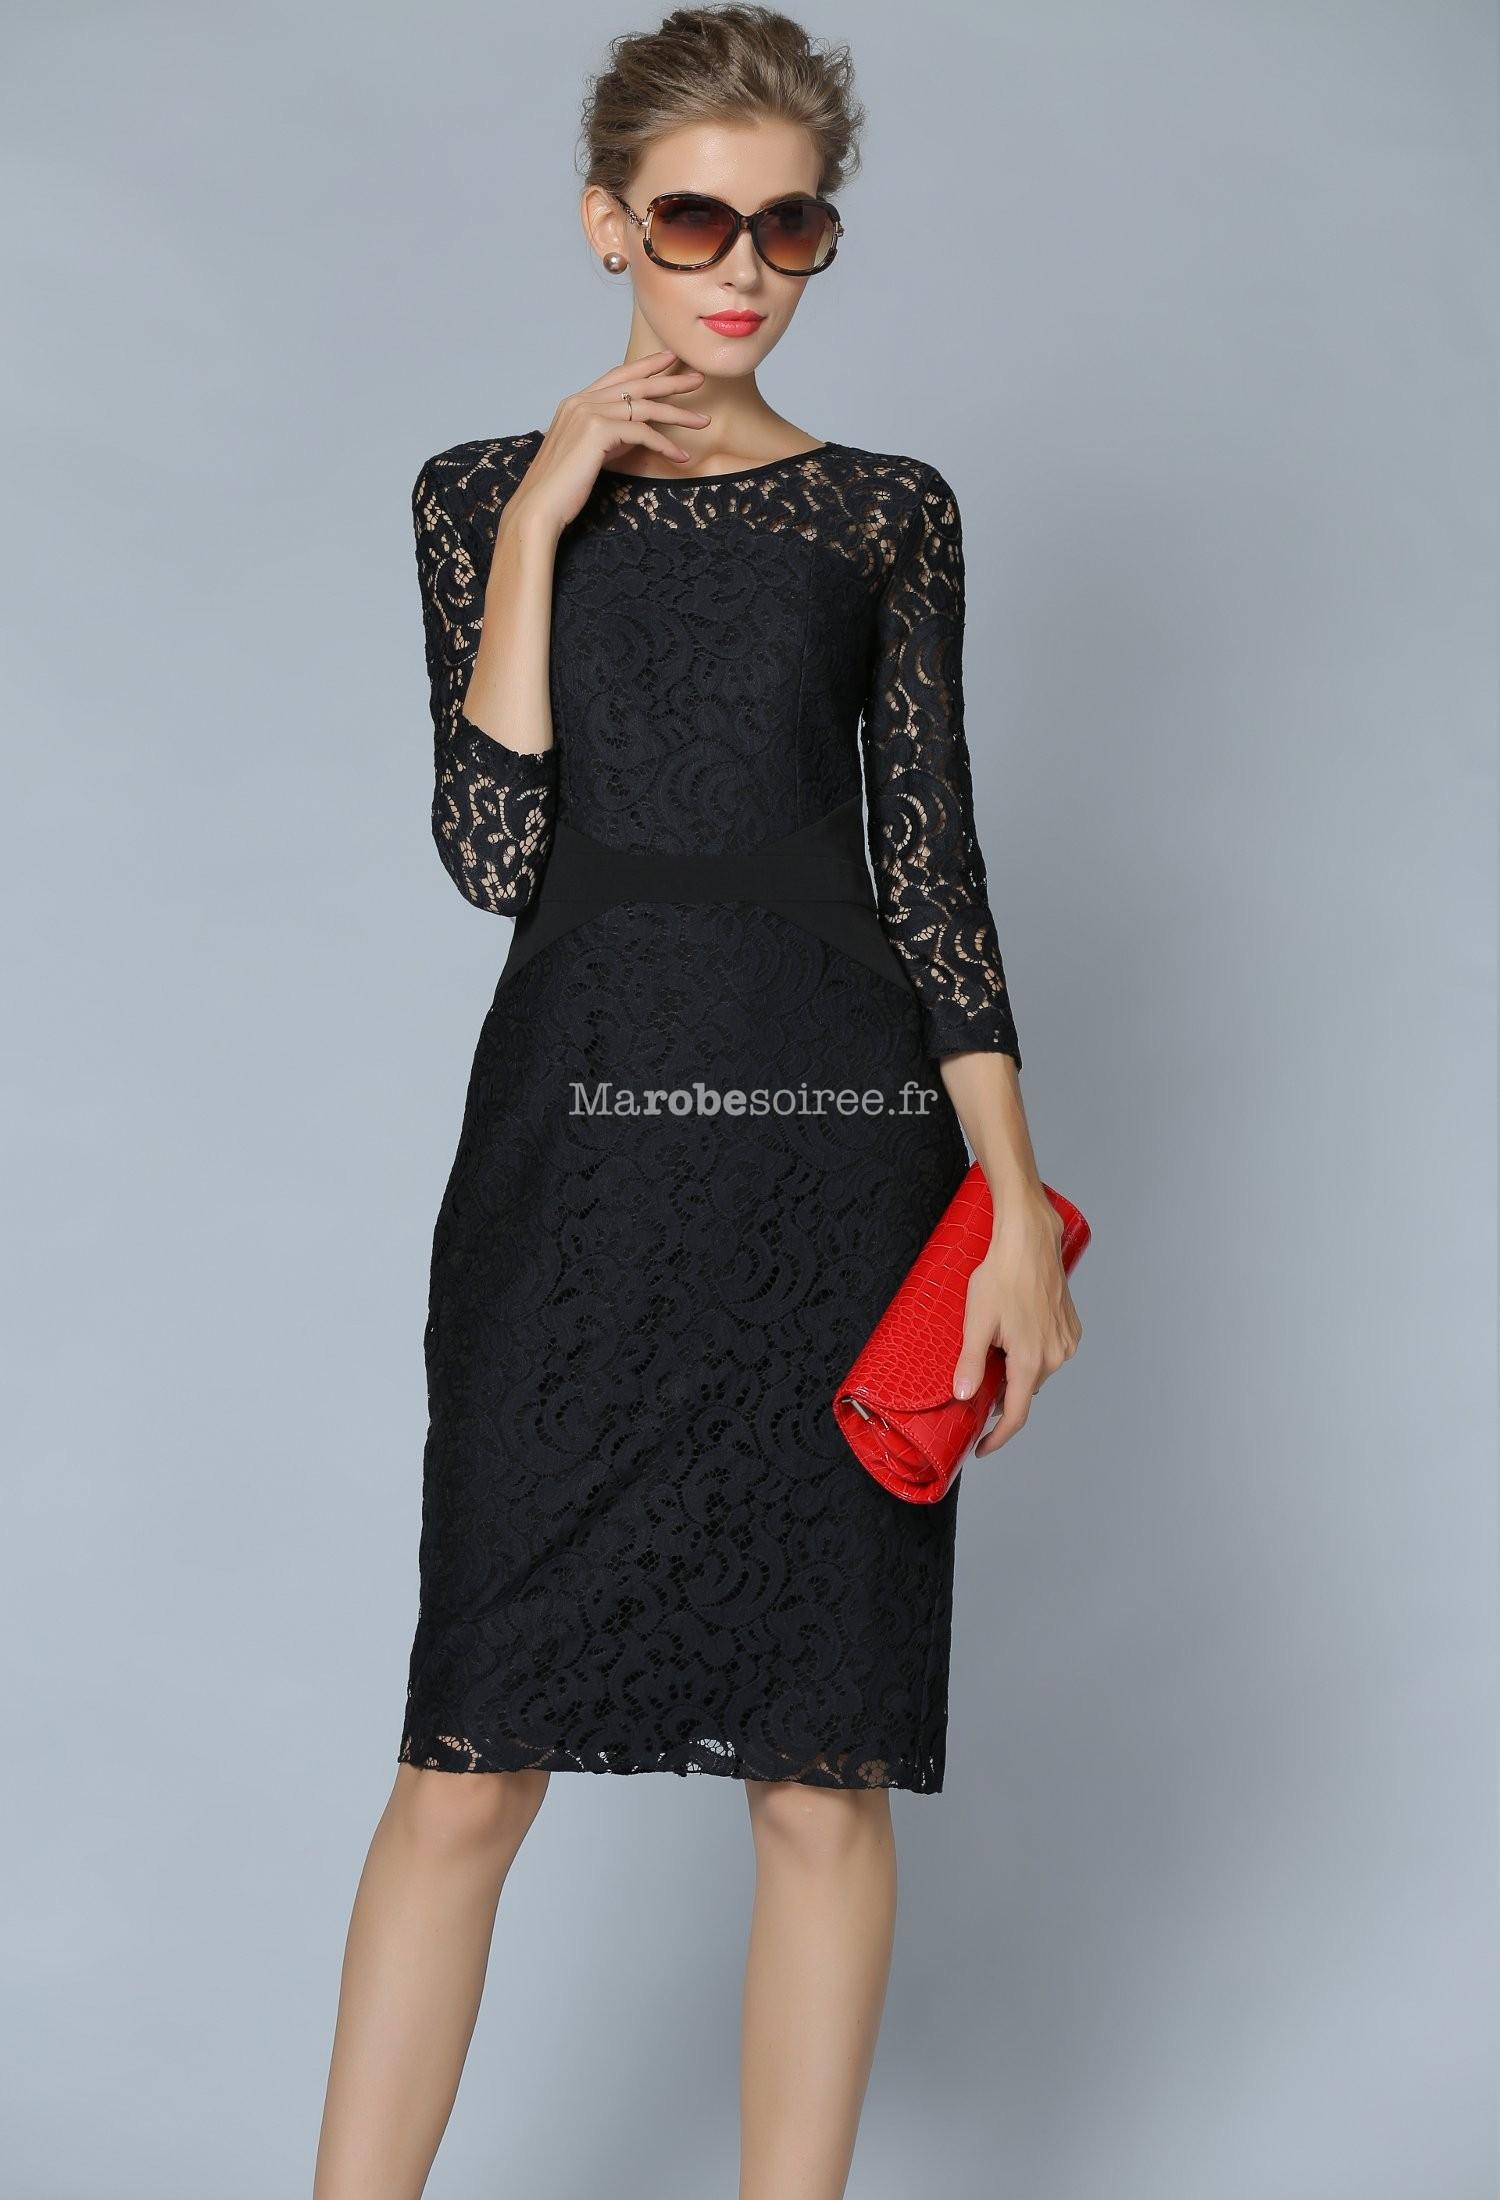 robe de cocktail tailleur rouge en dentelle. Black Bedroom Furniture Sets. Home Design Ideas